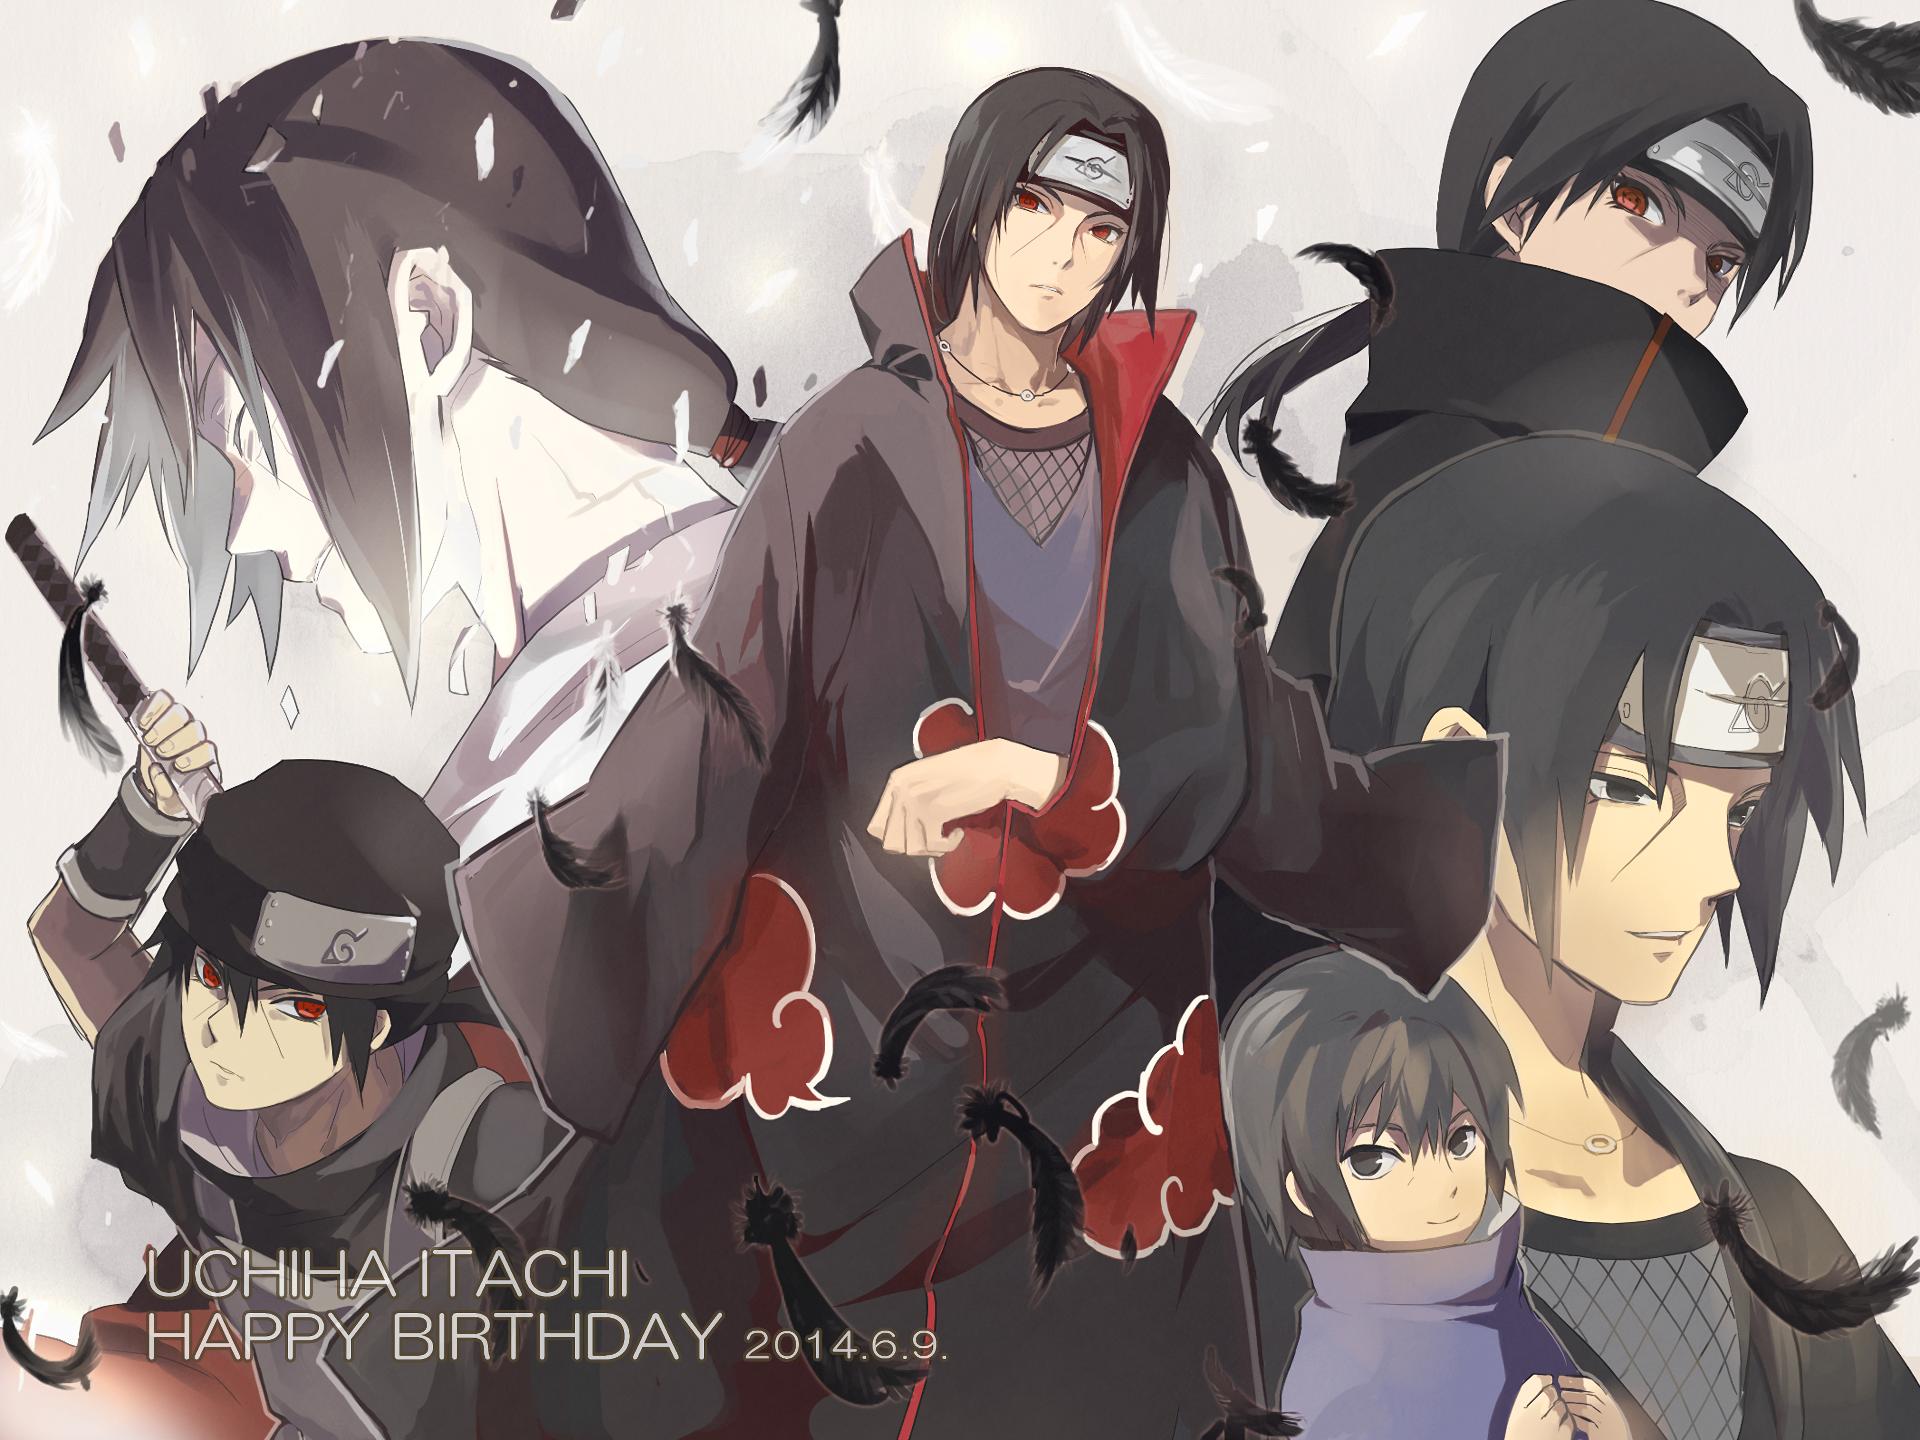 6 Shisui Uchiha HD Wallpapers Backgrounds Wallpaper Abyss